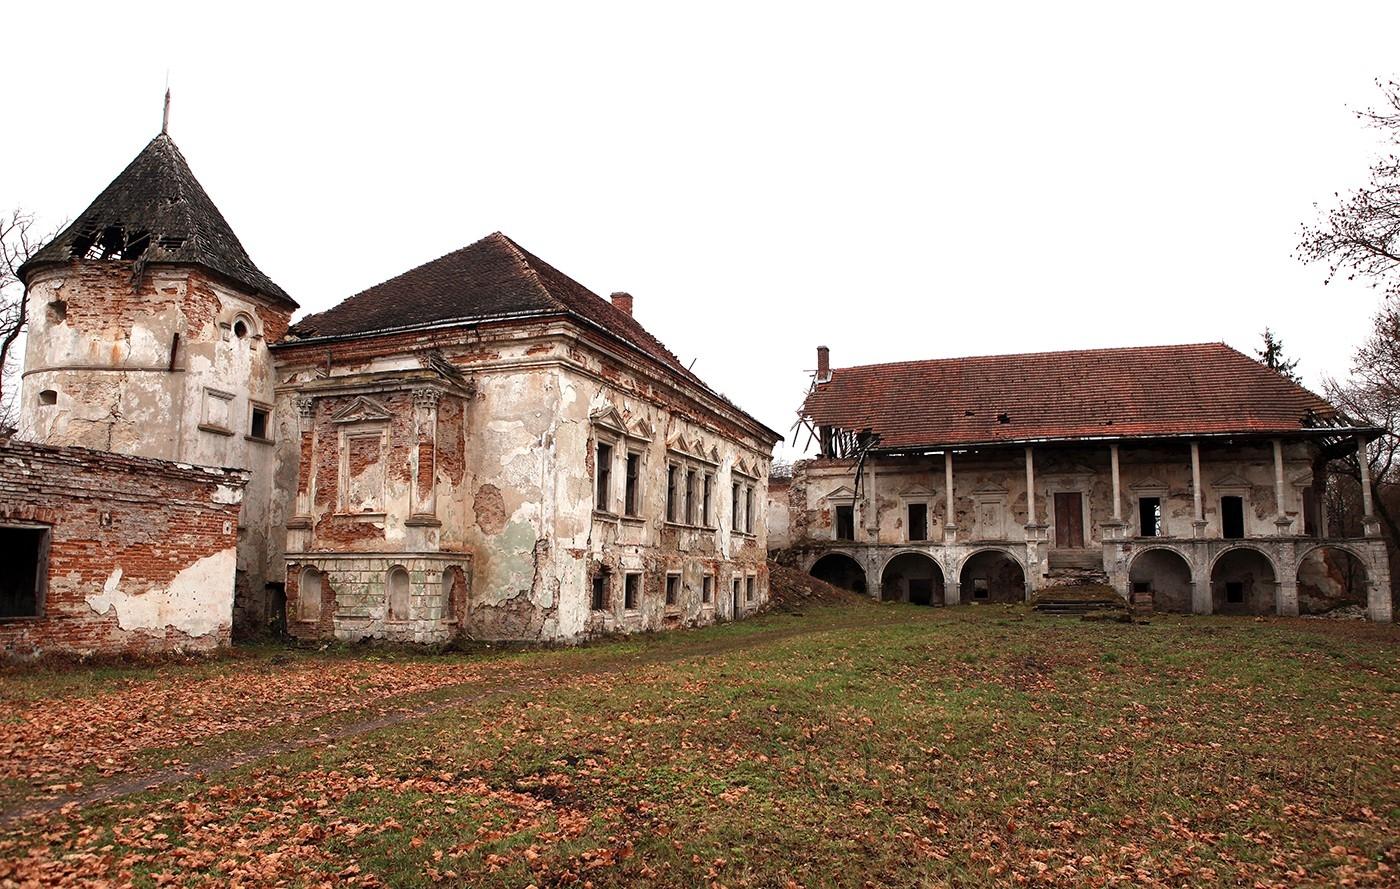 Pomoryany palace